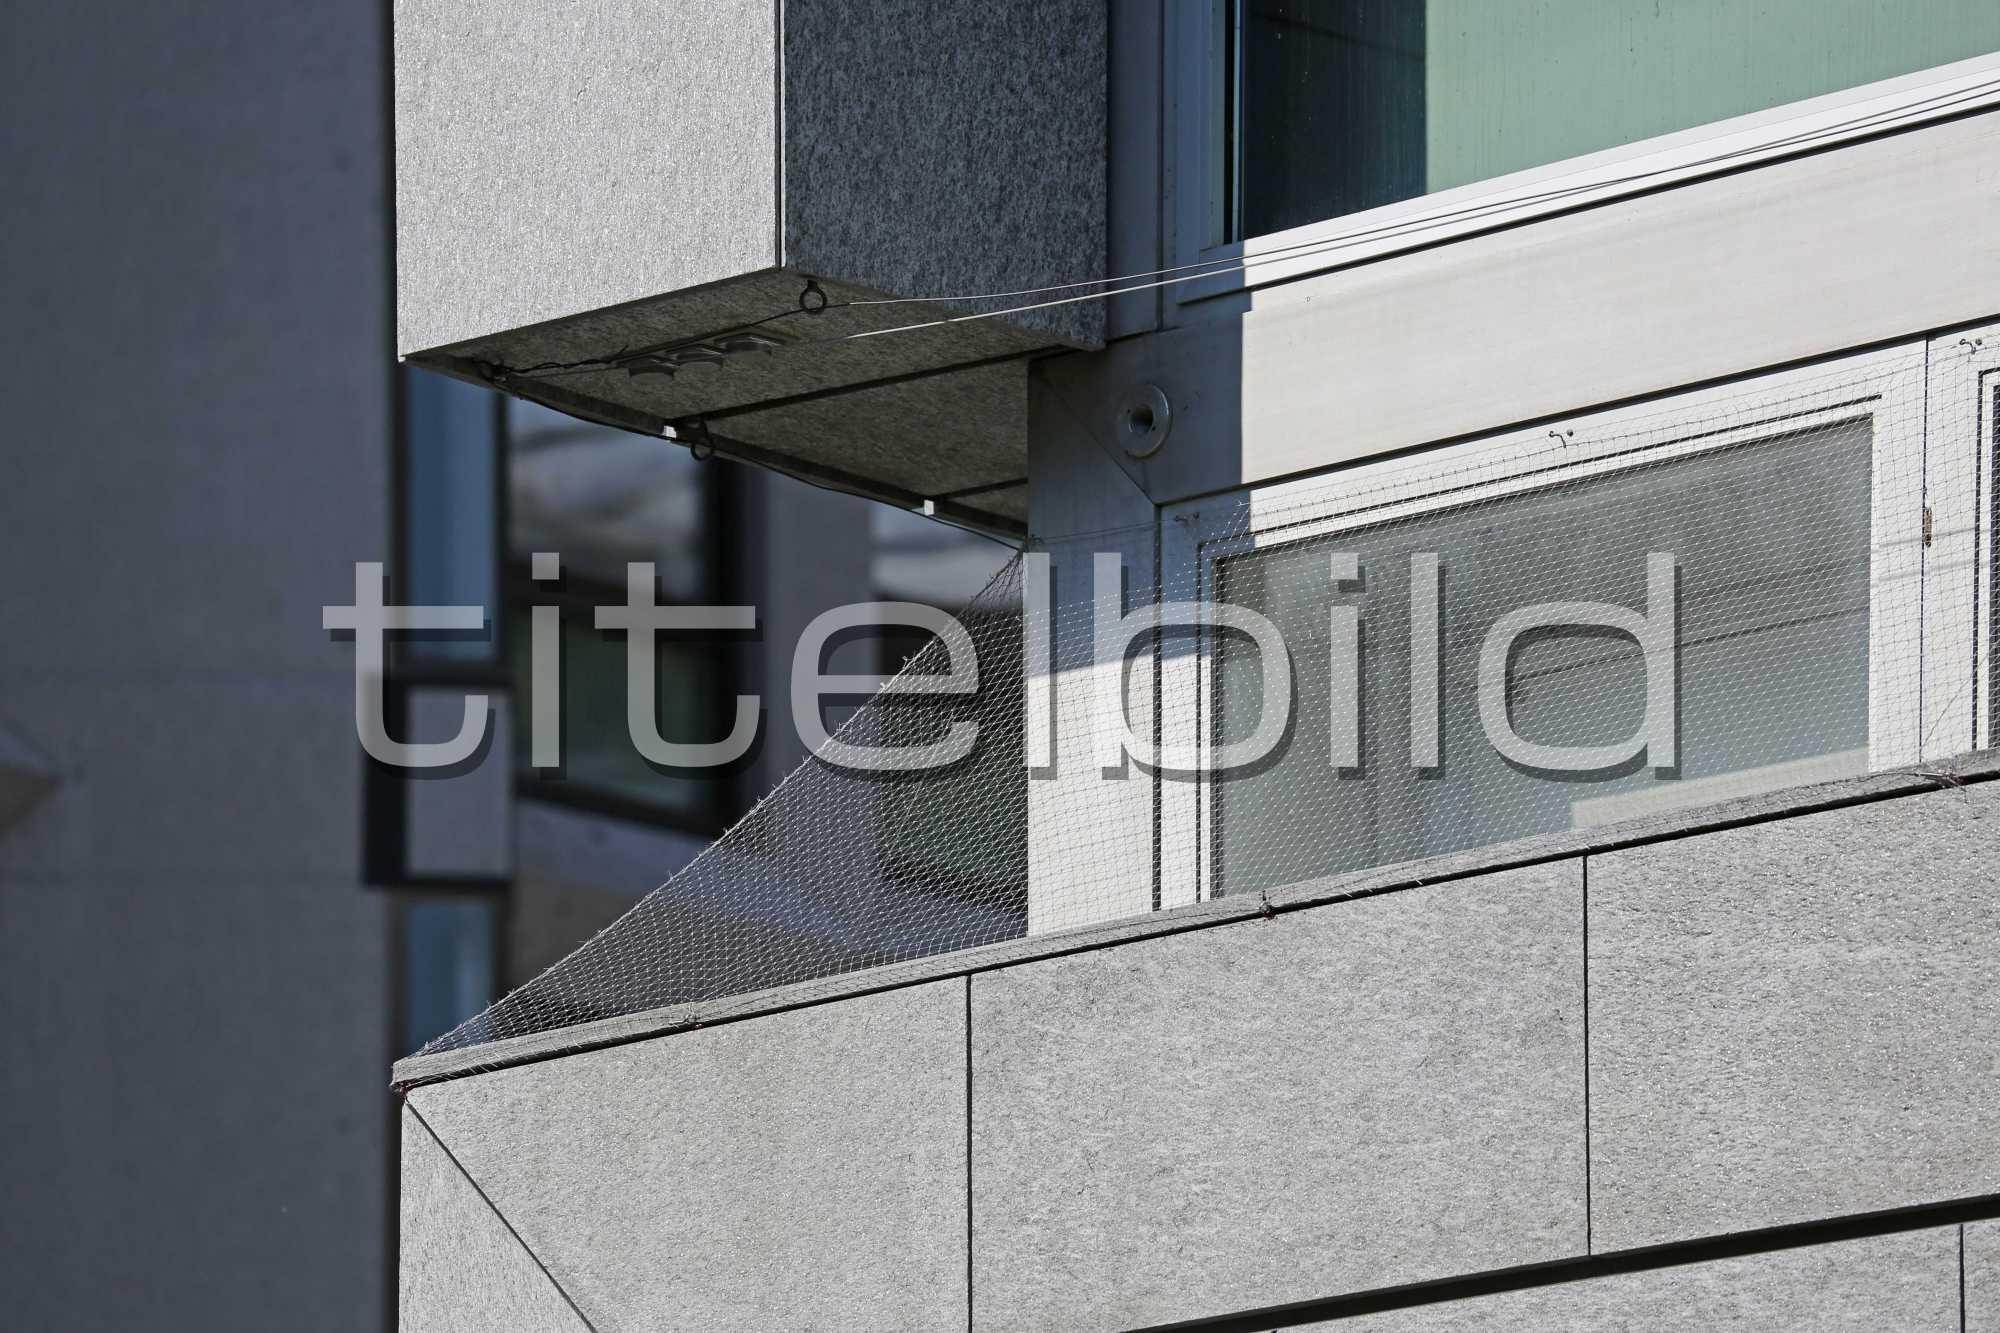 Projektbild-Nr. 3: Globus Zürich Bahnhofstrasse